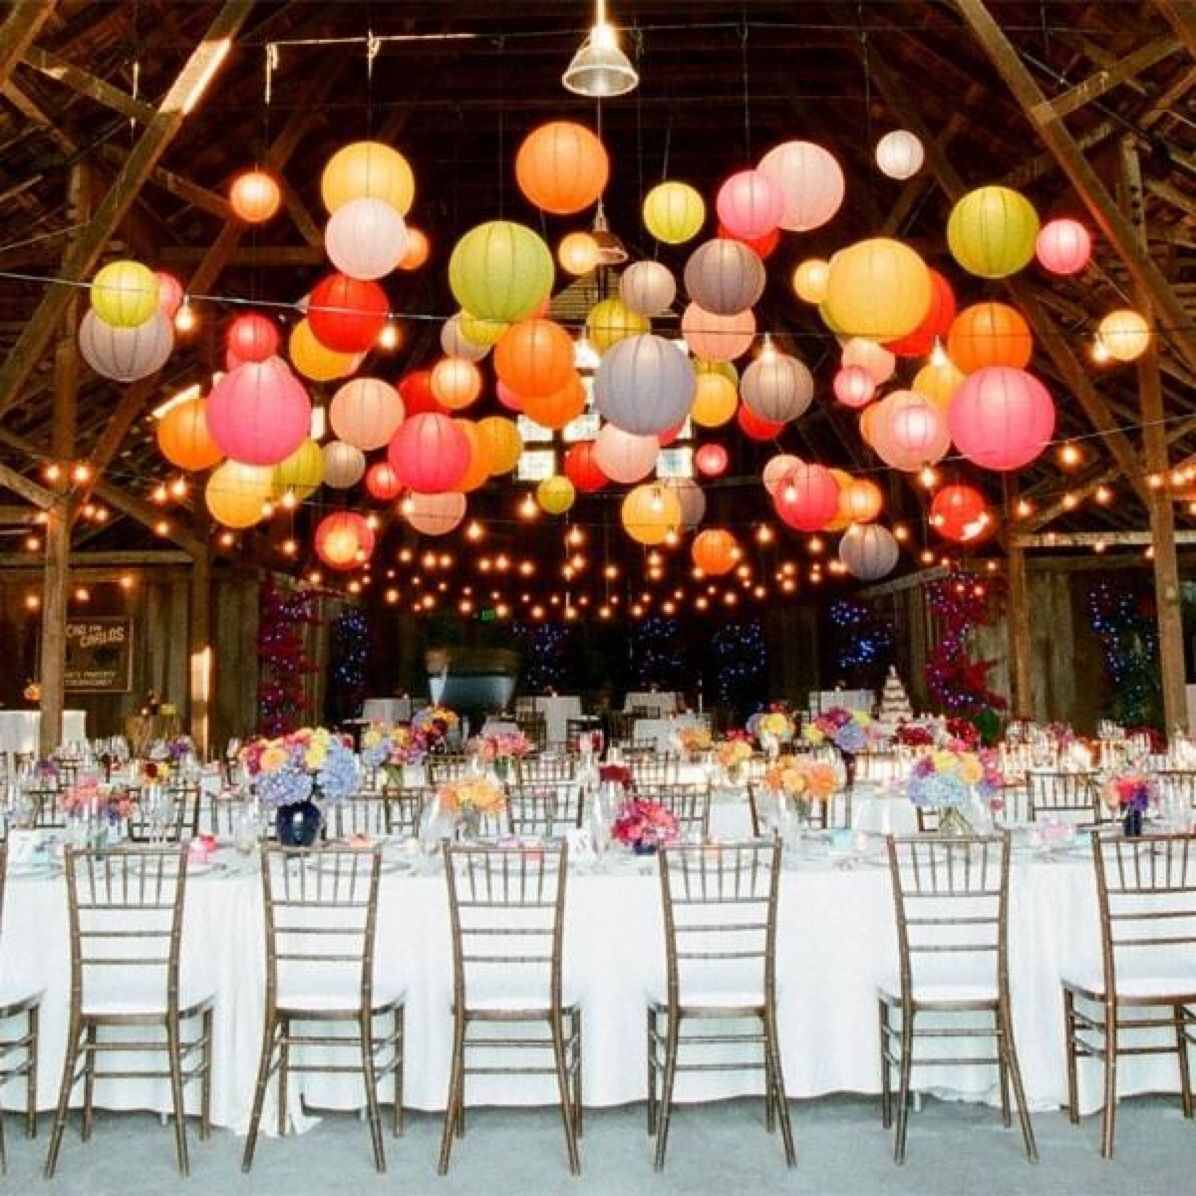 Country wedding decorations - Hanging lanterns.   Wedding Dresses ...